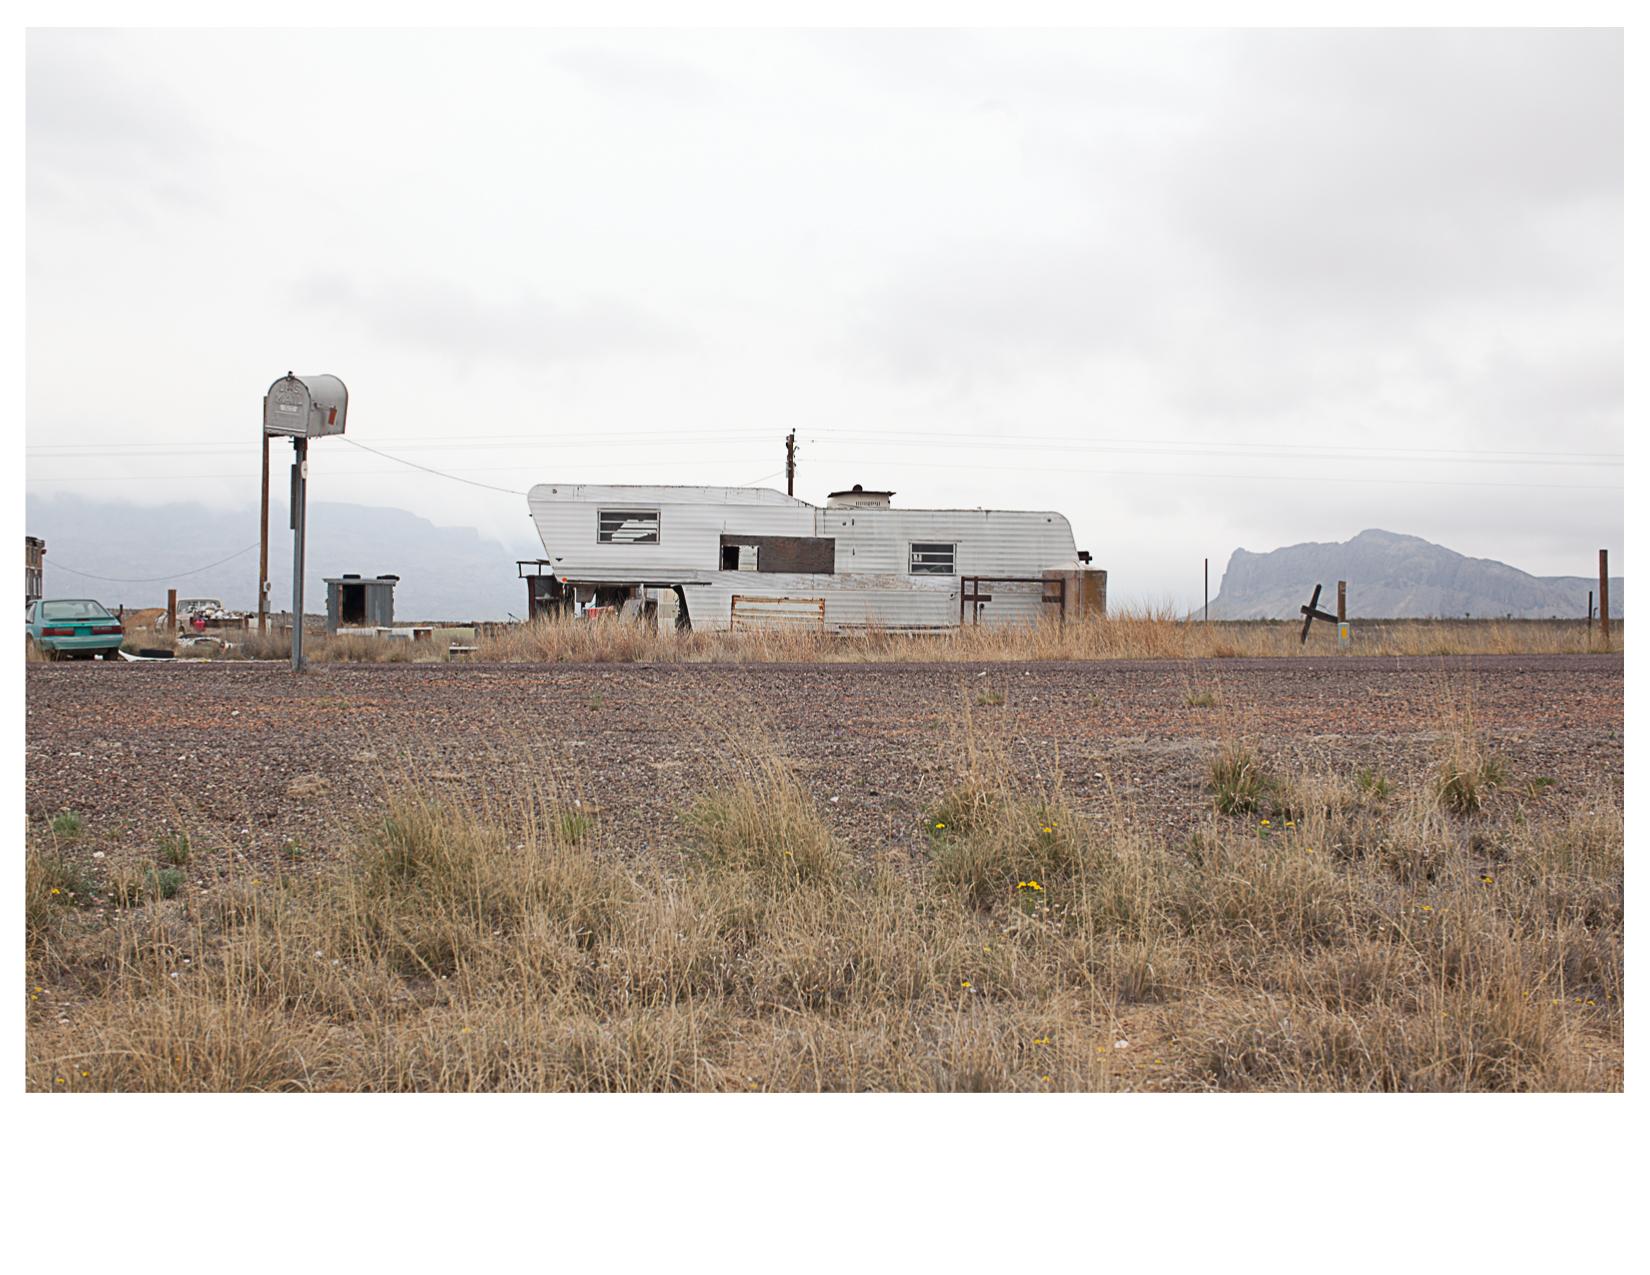 Trailer Home, North of Terlingua, TX